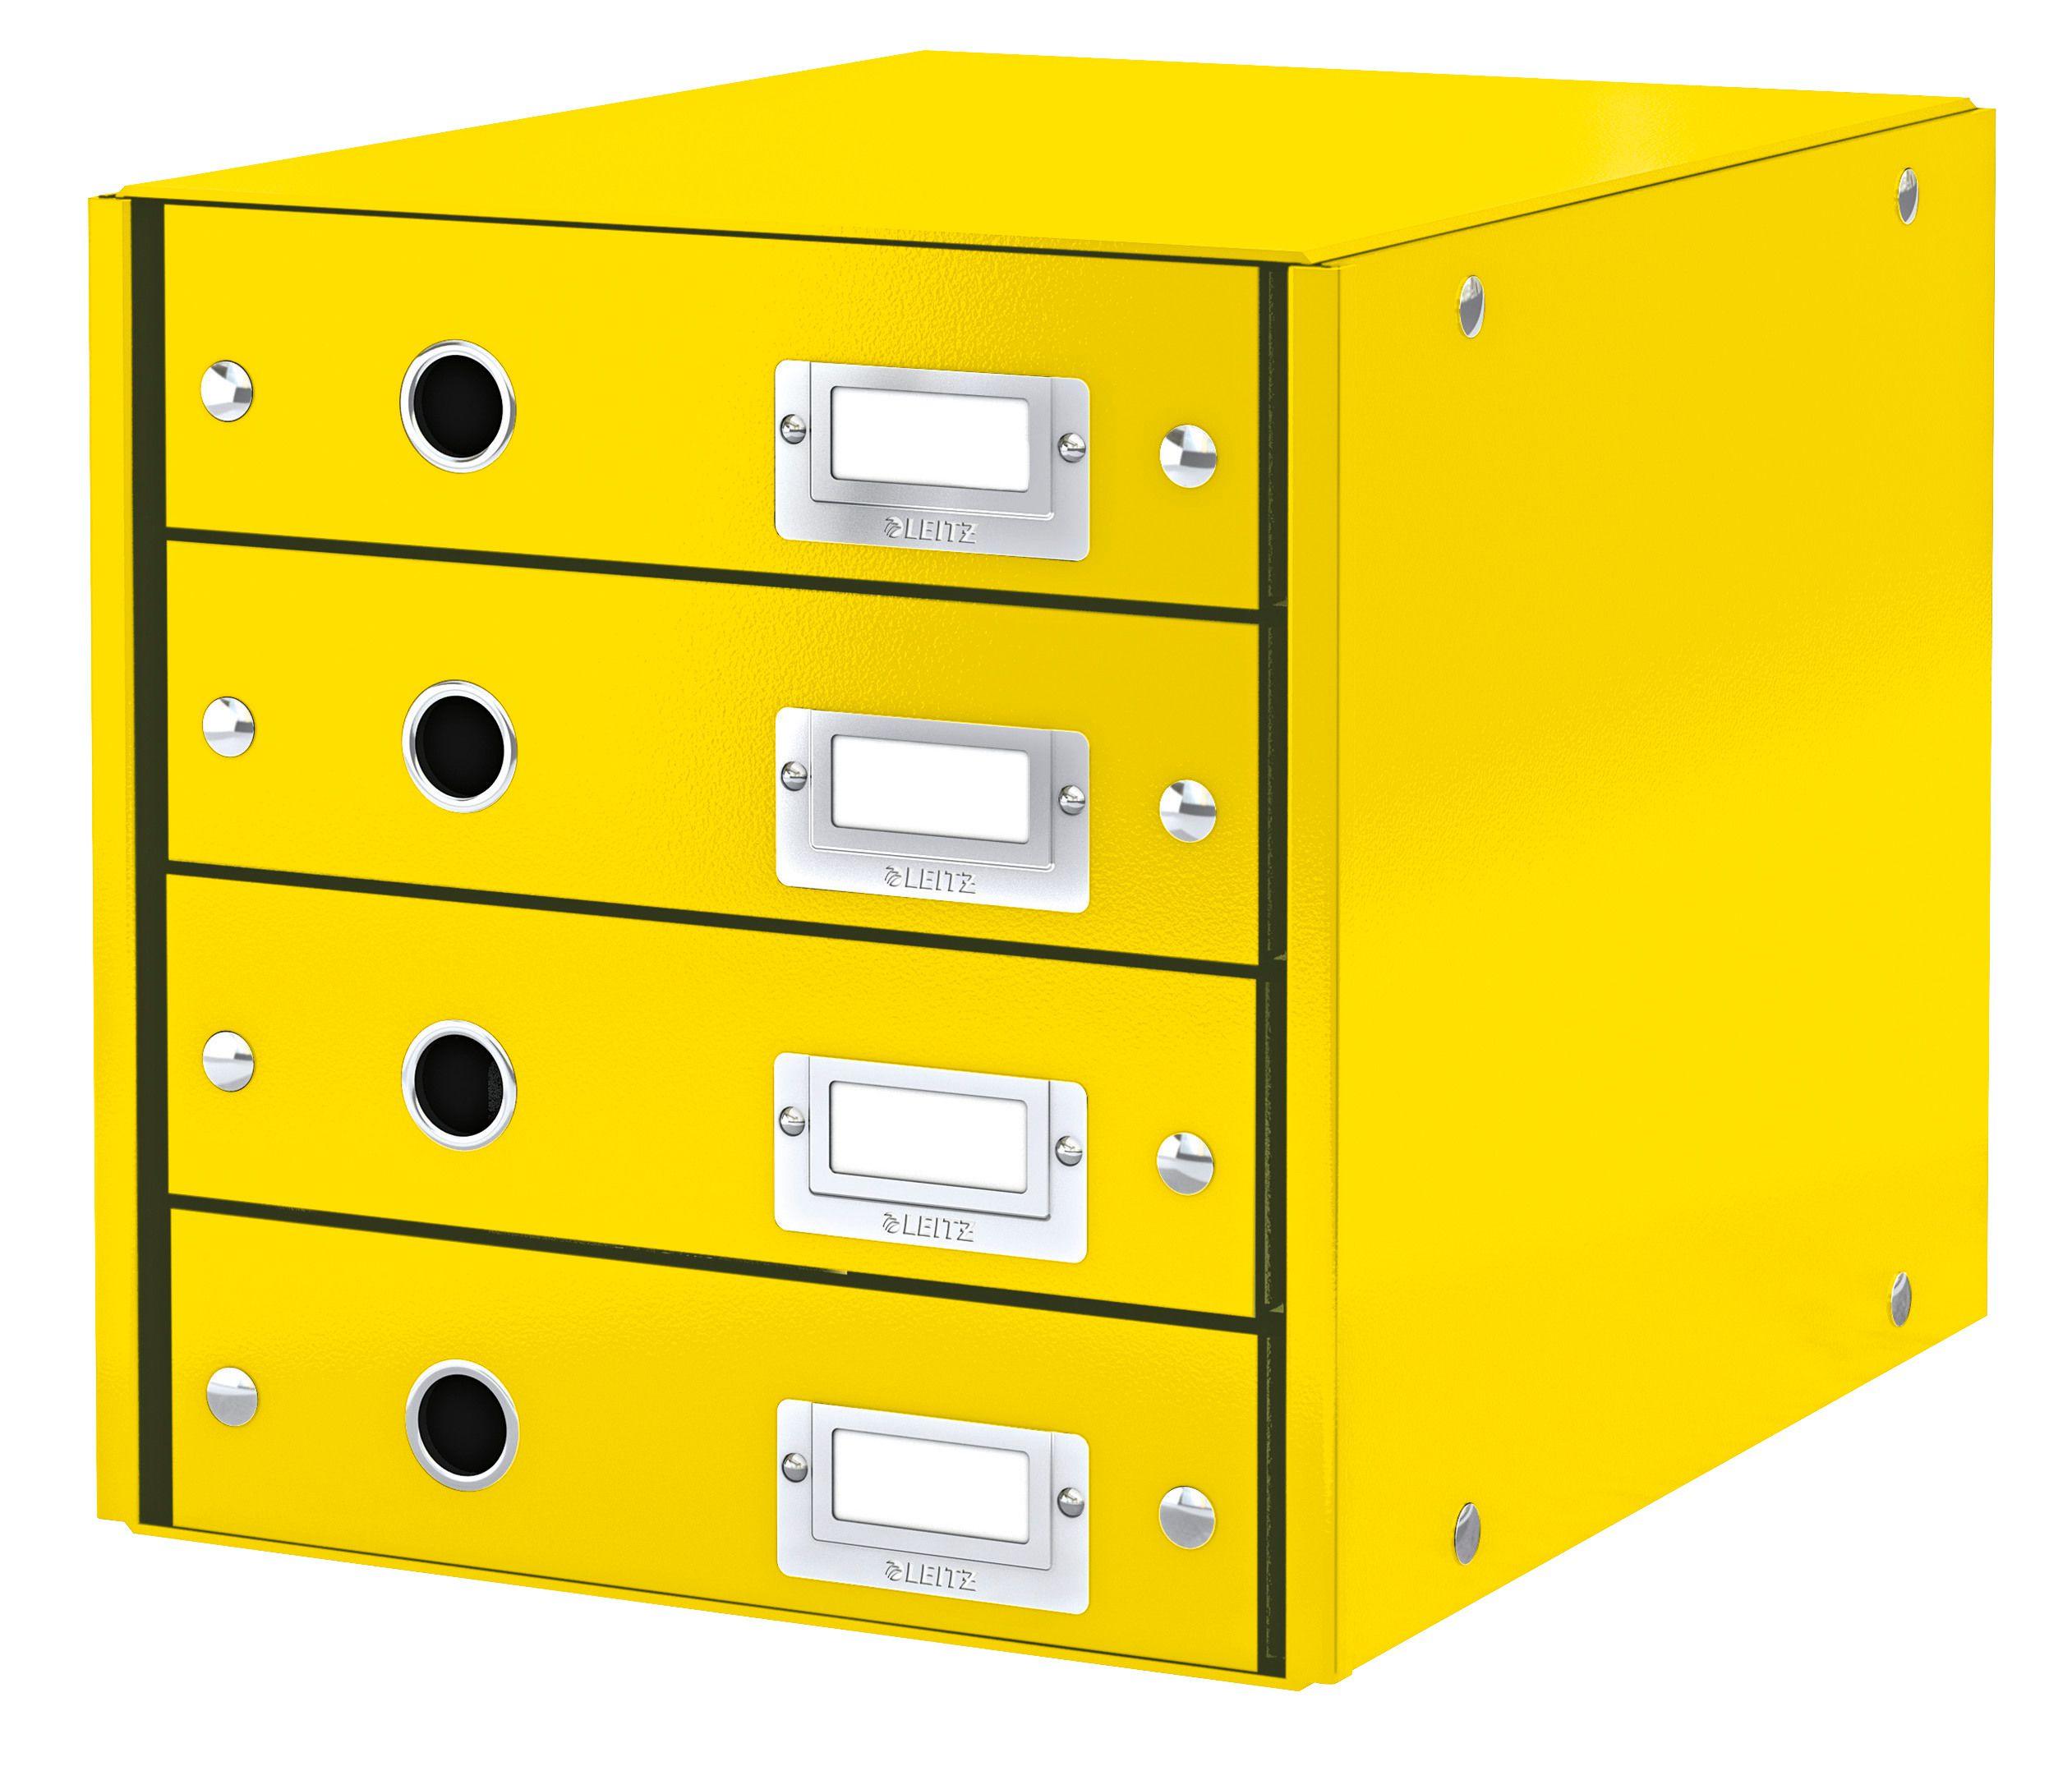 Leitz Schubladenbox 4 Schubladen 60490095 Schwarz Click /& Store A4